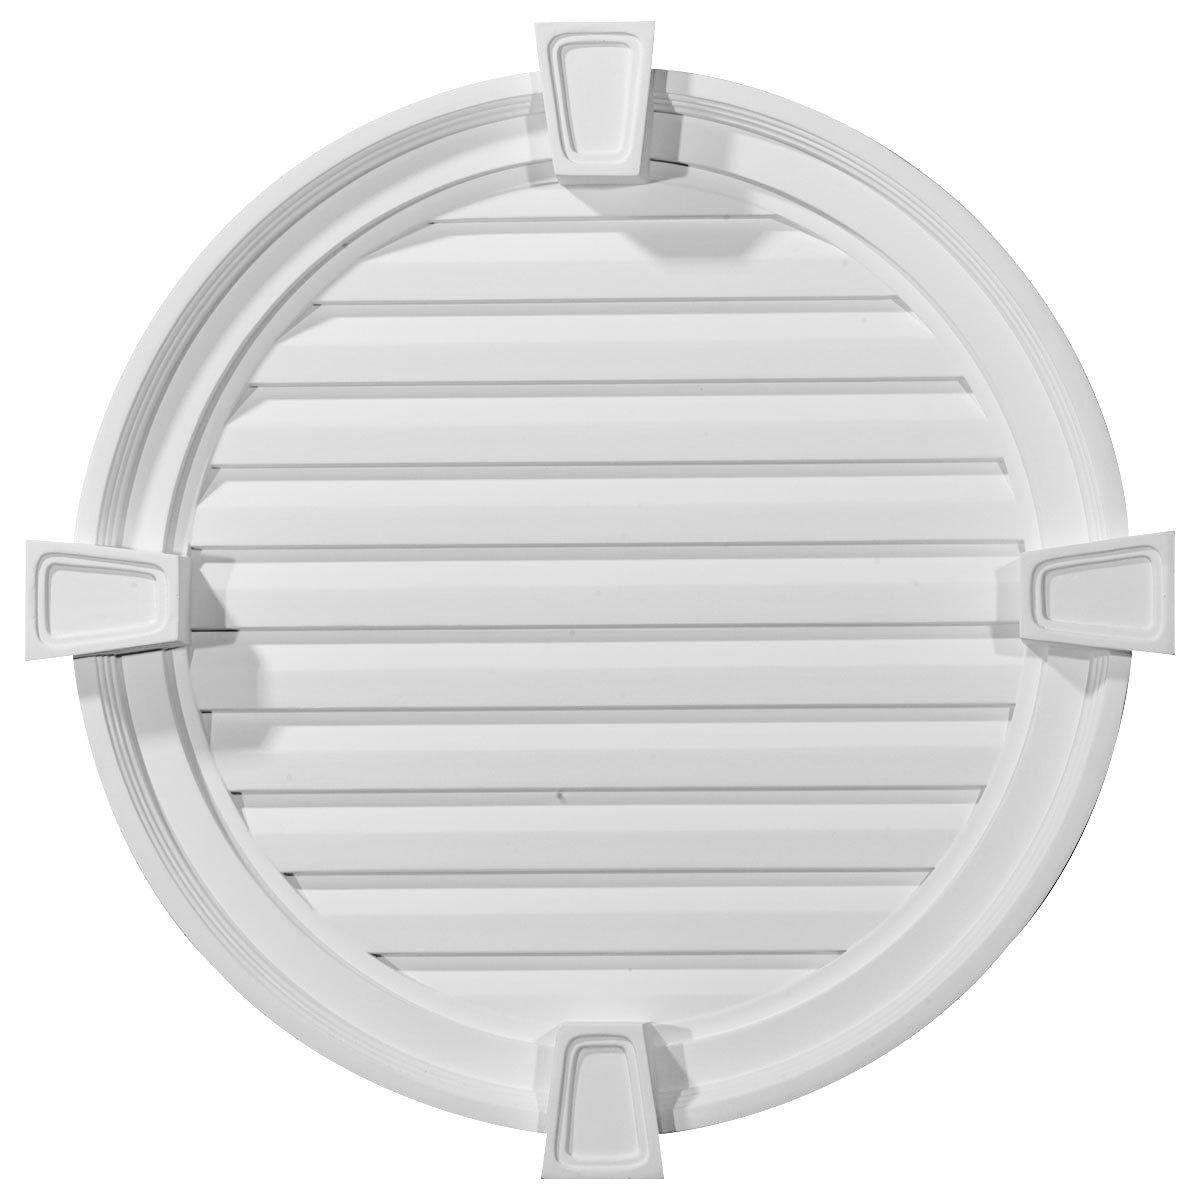 Ekena Millwork GVRO24FK 24-Inch W x 24-Inch H x 2 1/8-Inch P Round Gable Vent with Keystones, Functional